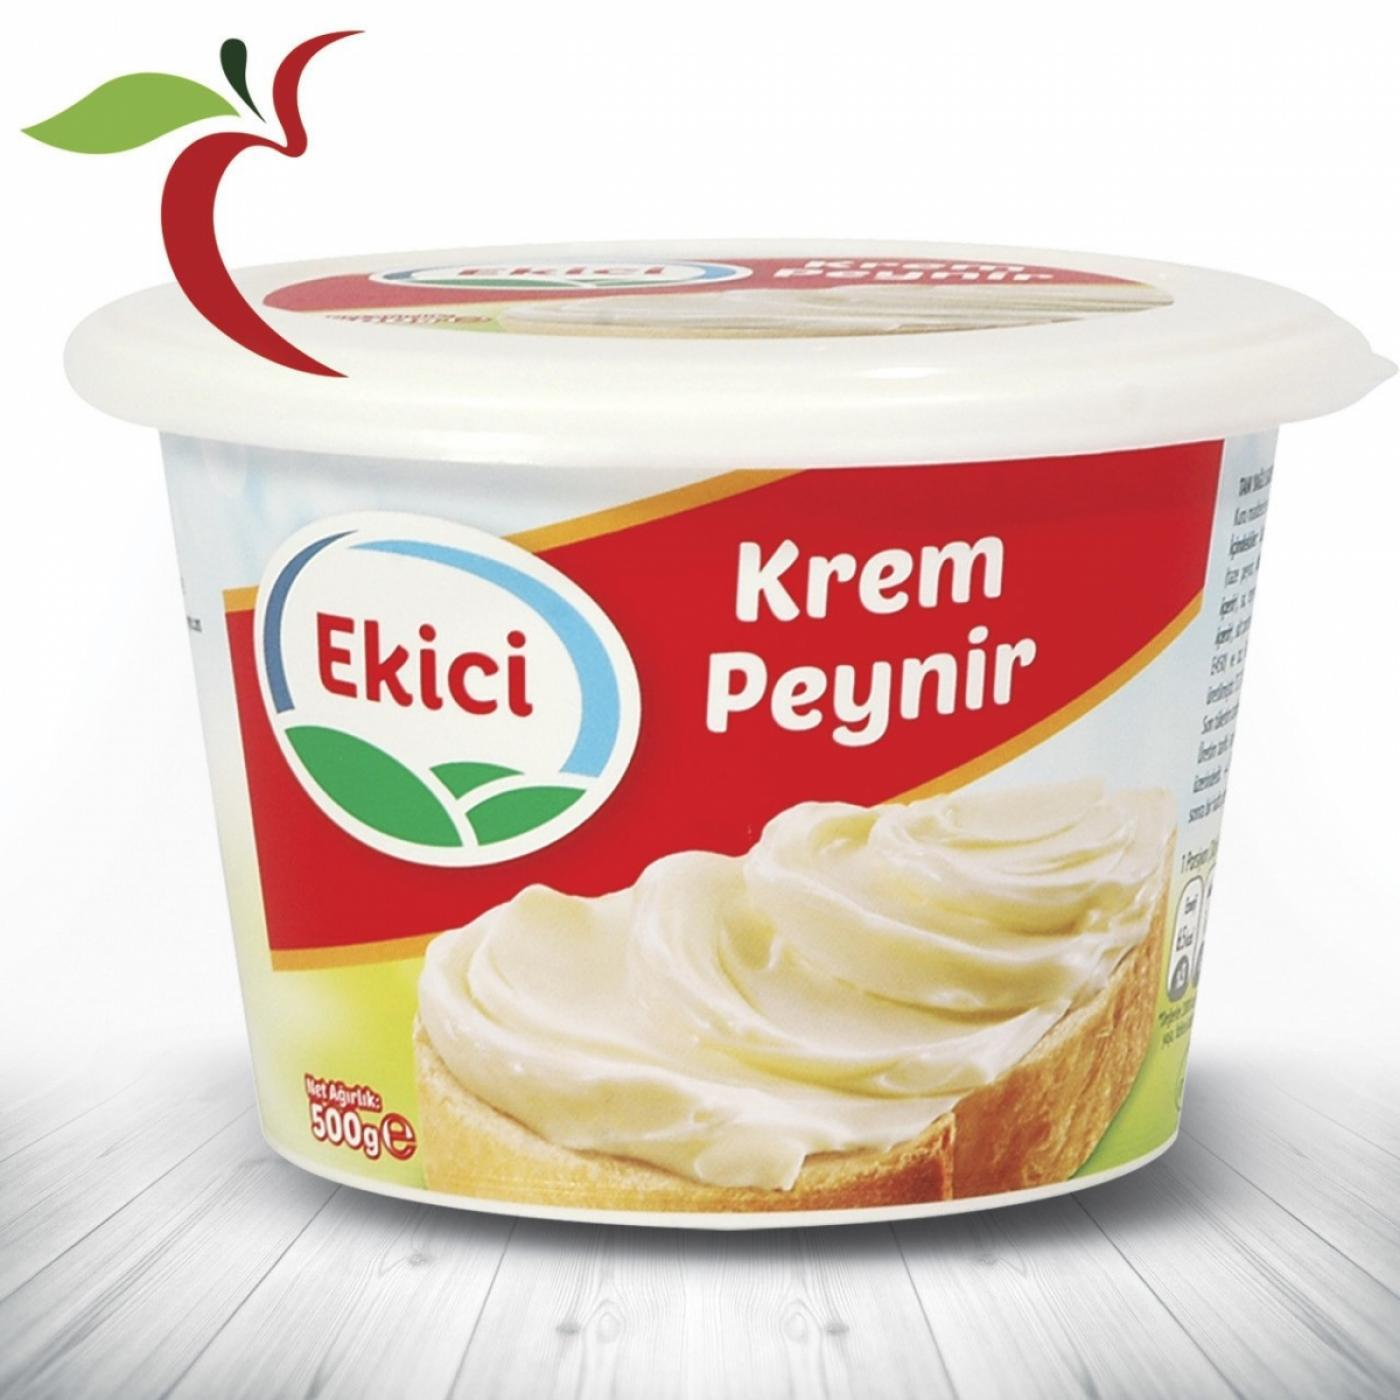 EKİCİ KREM PEYNİR 500GR